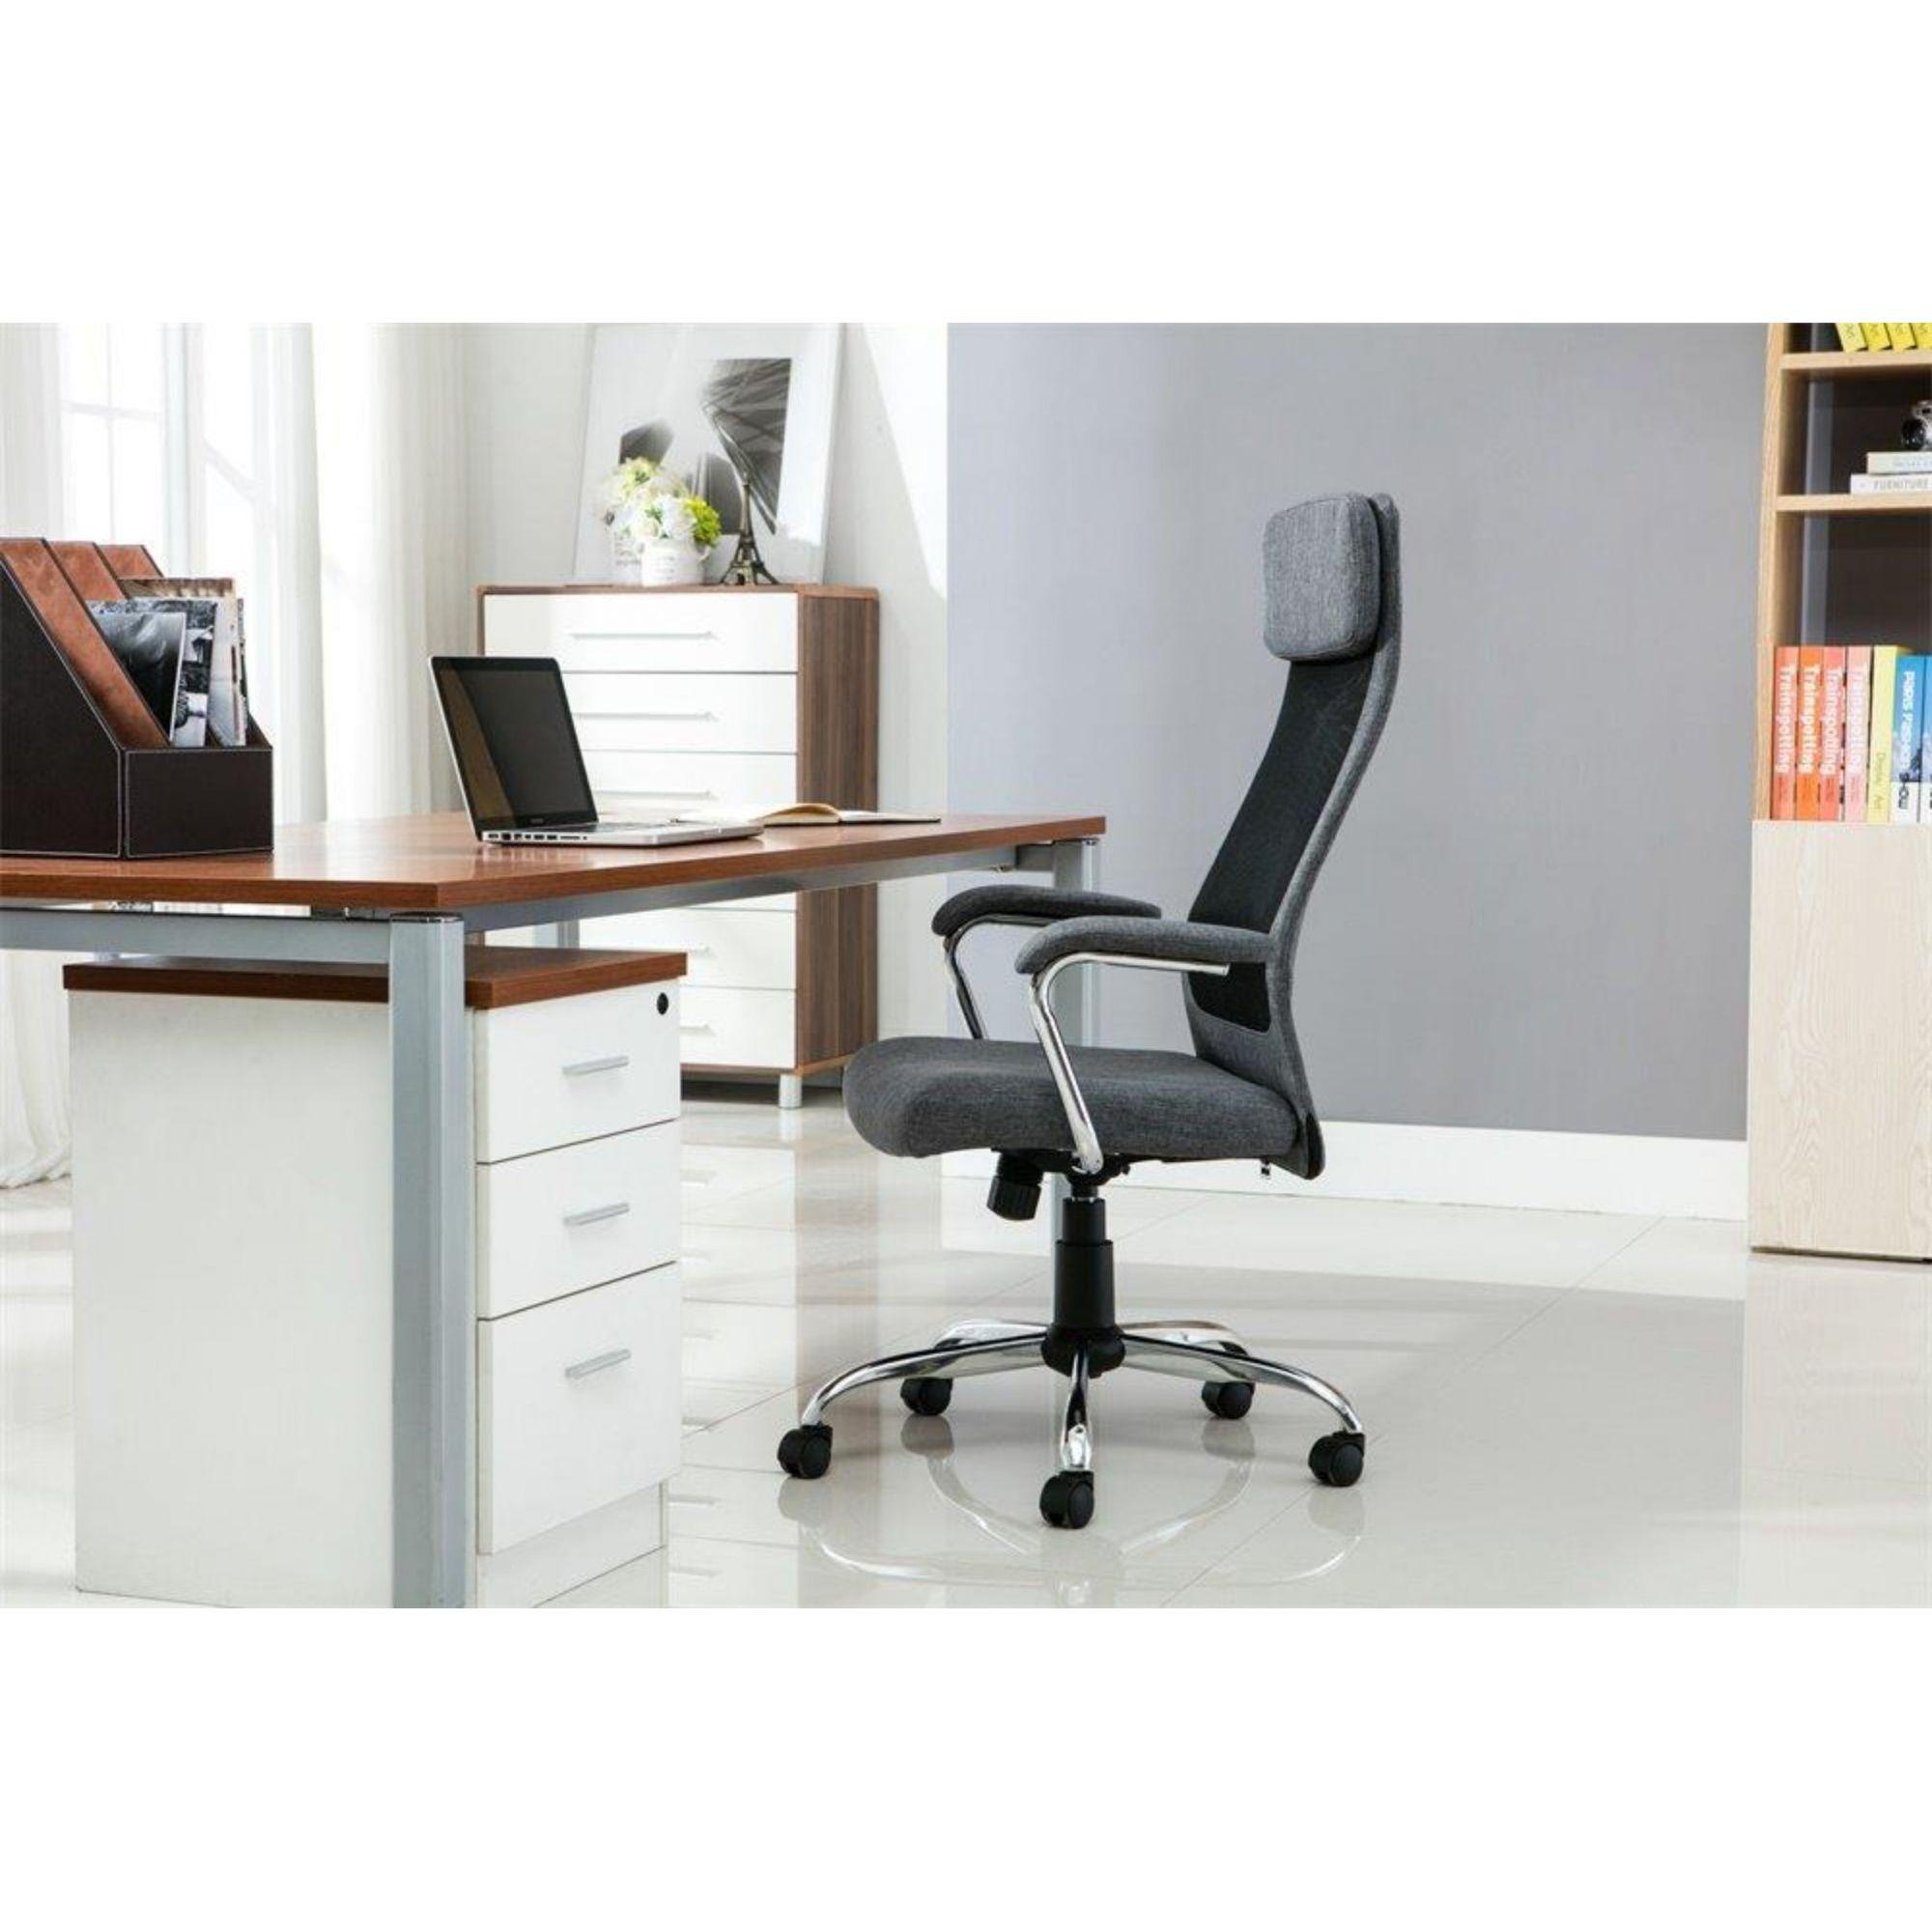 Cadeira de Escritório Presidente Pelegrin Pel-9025 Cinza